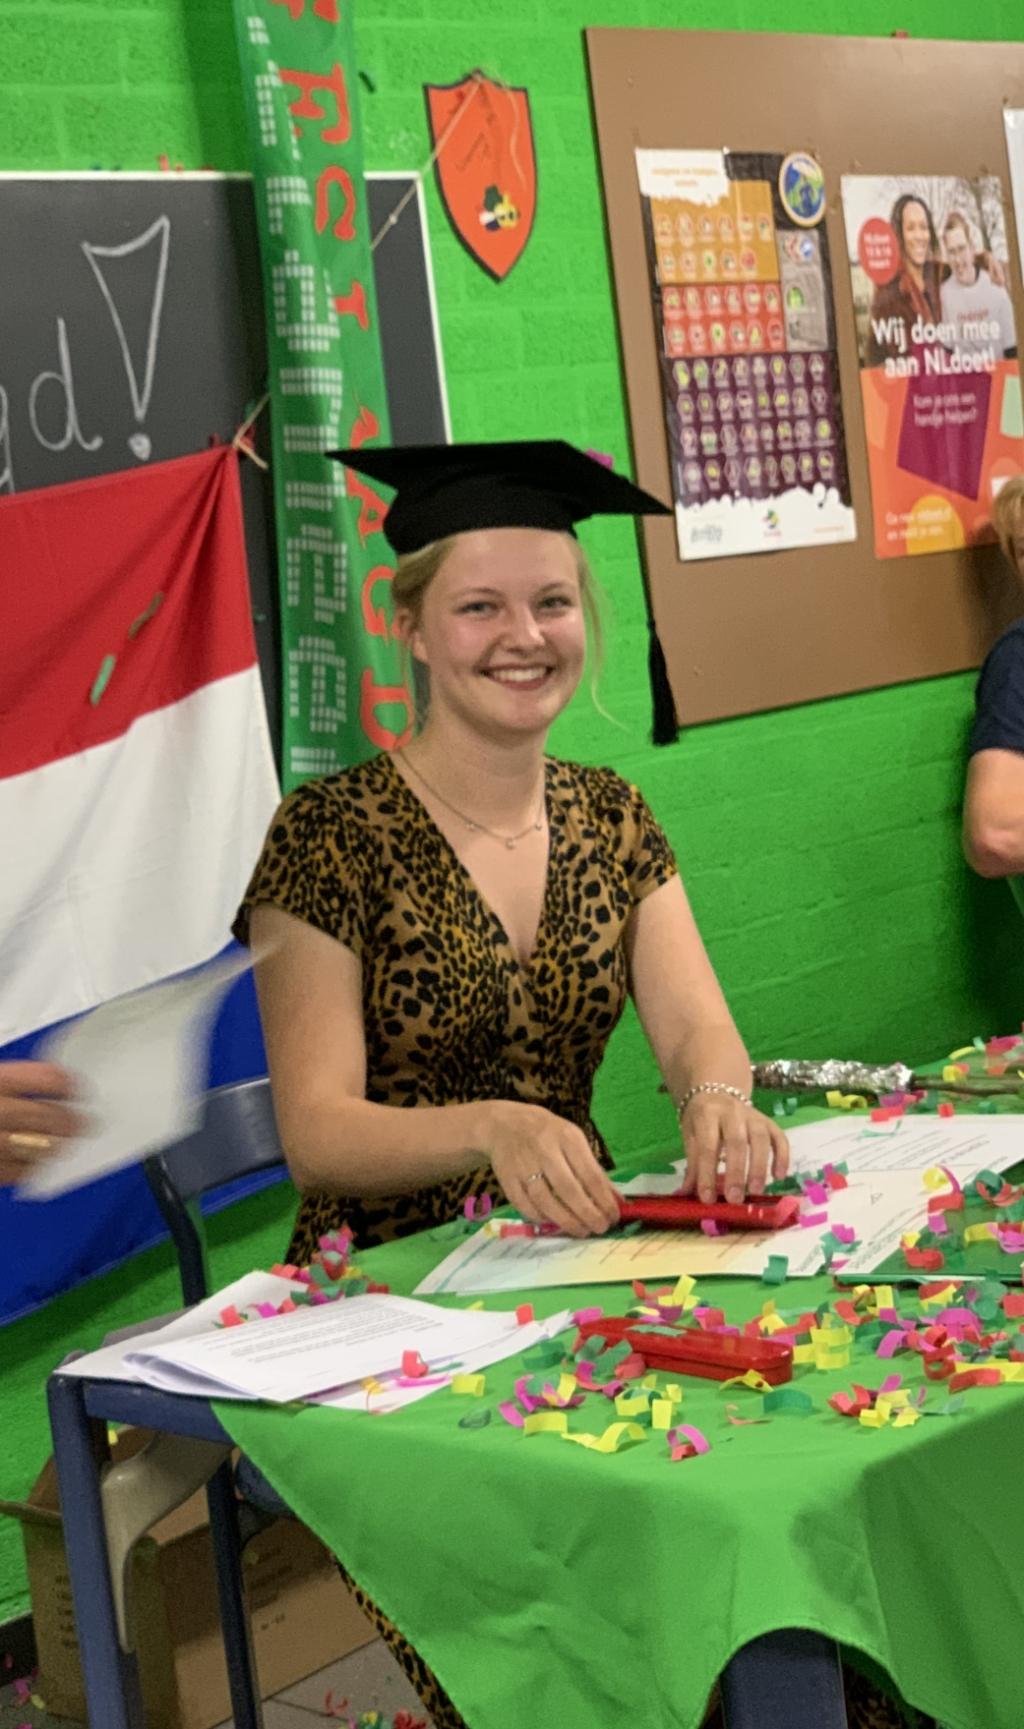 Britt Logtens ondertekent haar vwo-diploma.   © Kliknieuws De Maas Driehoek